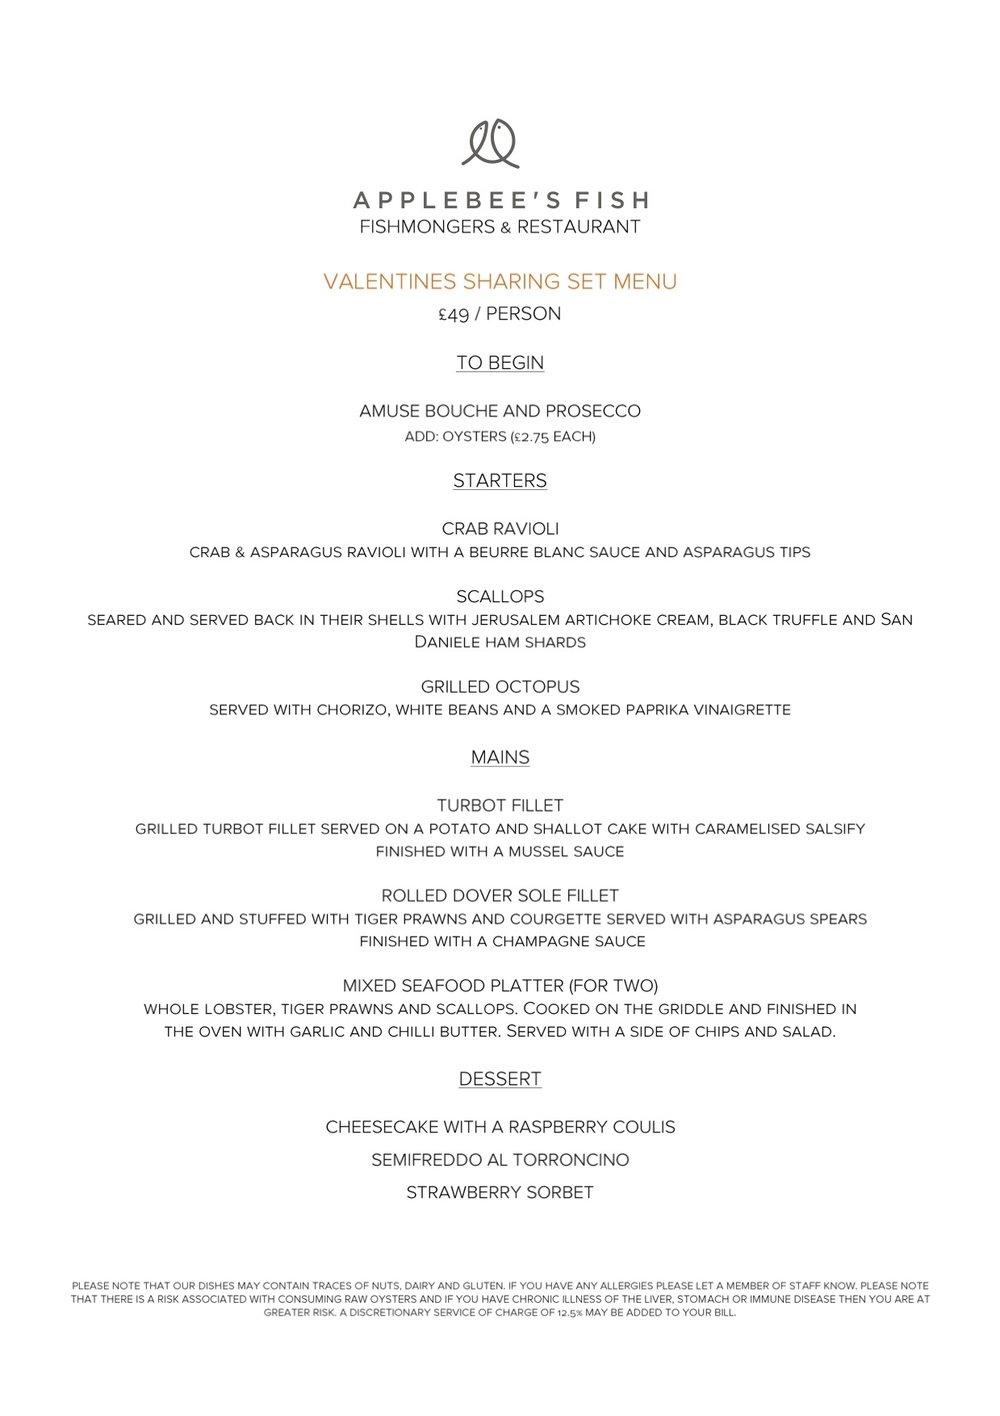 Valentine menu 2019 IMG.jpg